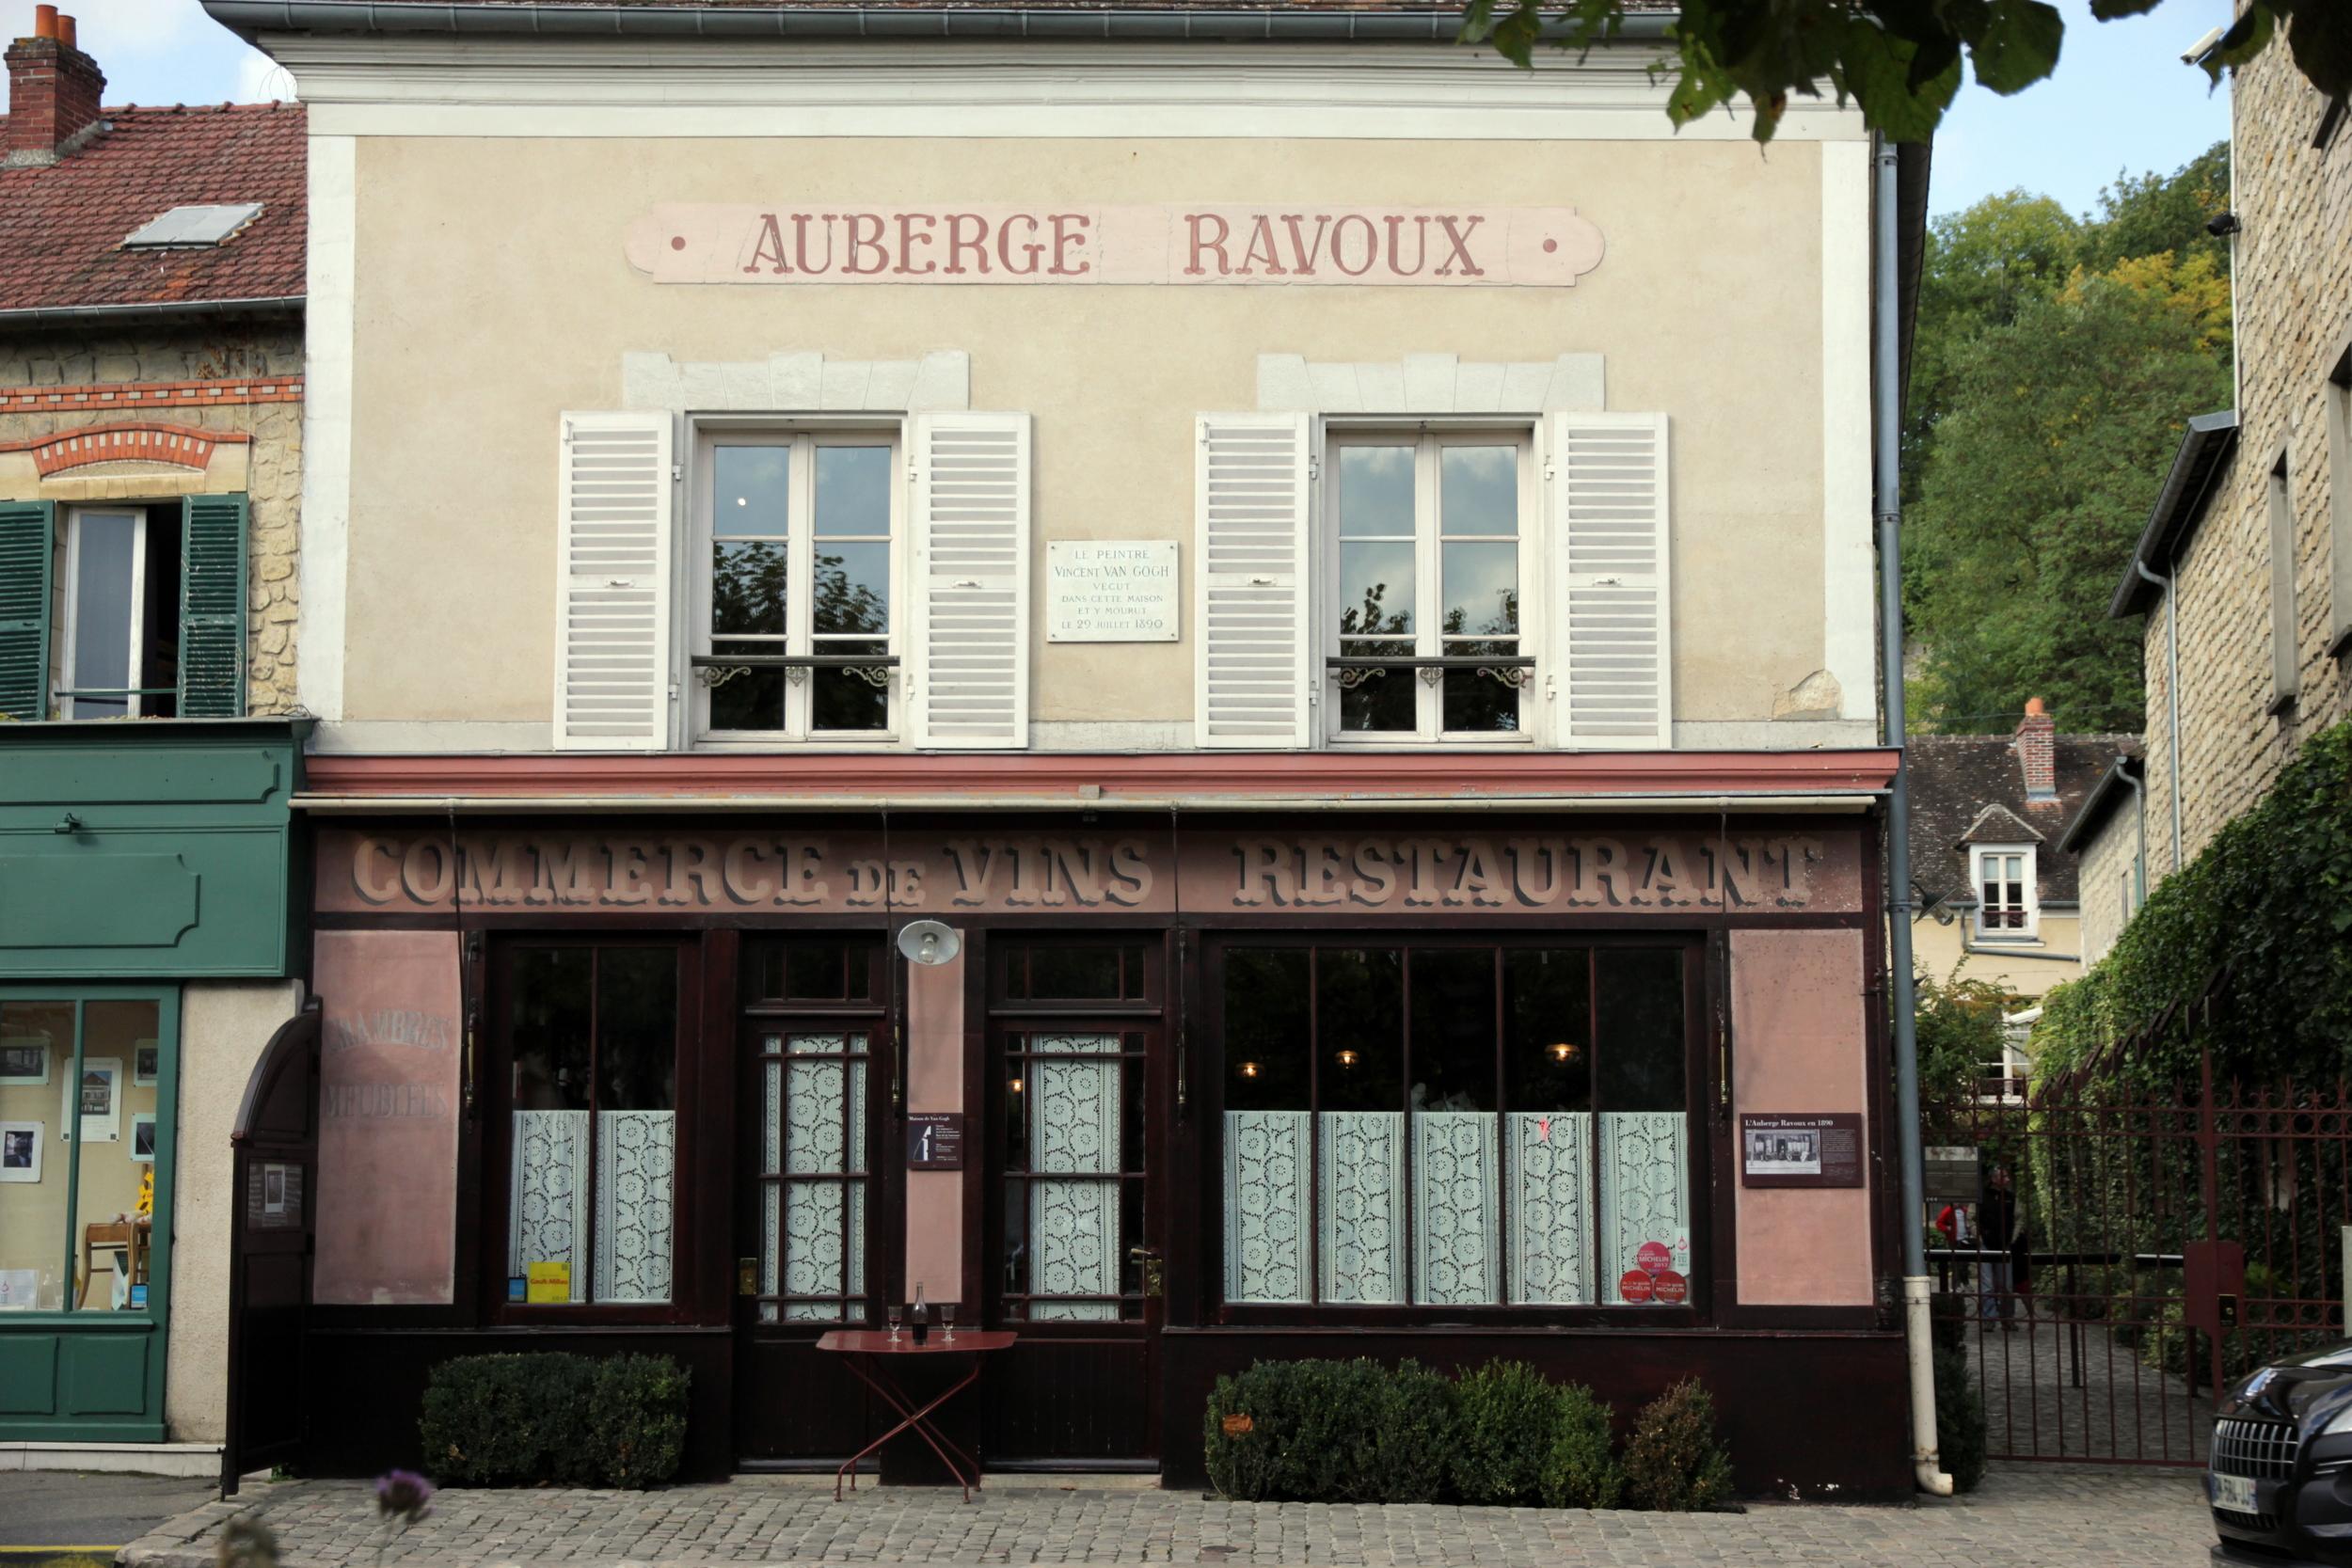 The  Auberge Ravoux , where Vincent van Gogh spent his final days.